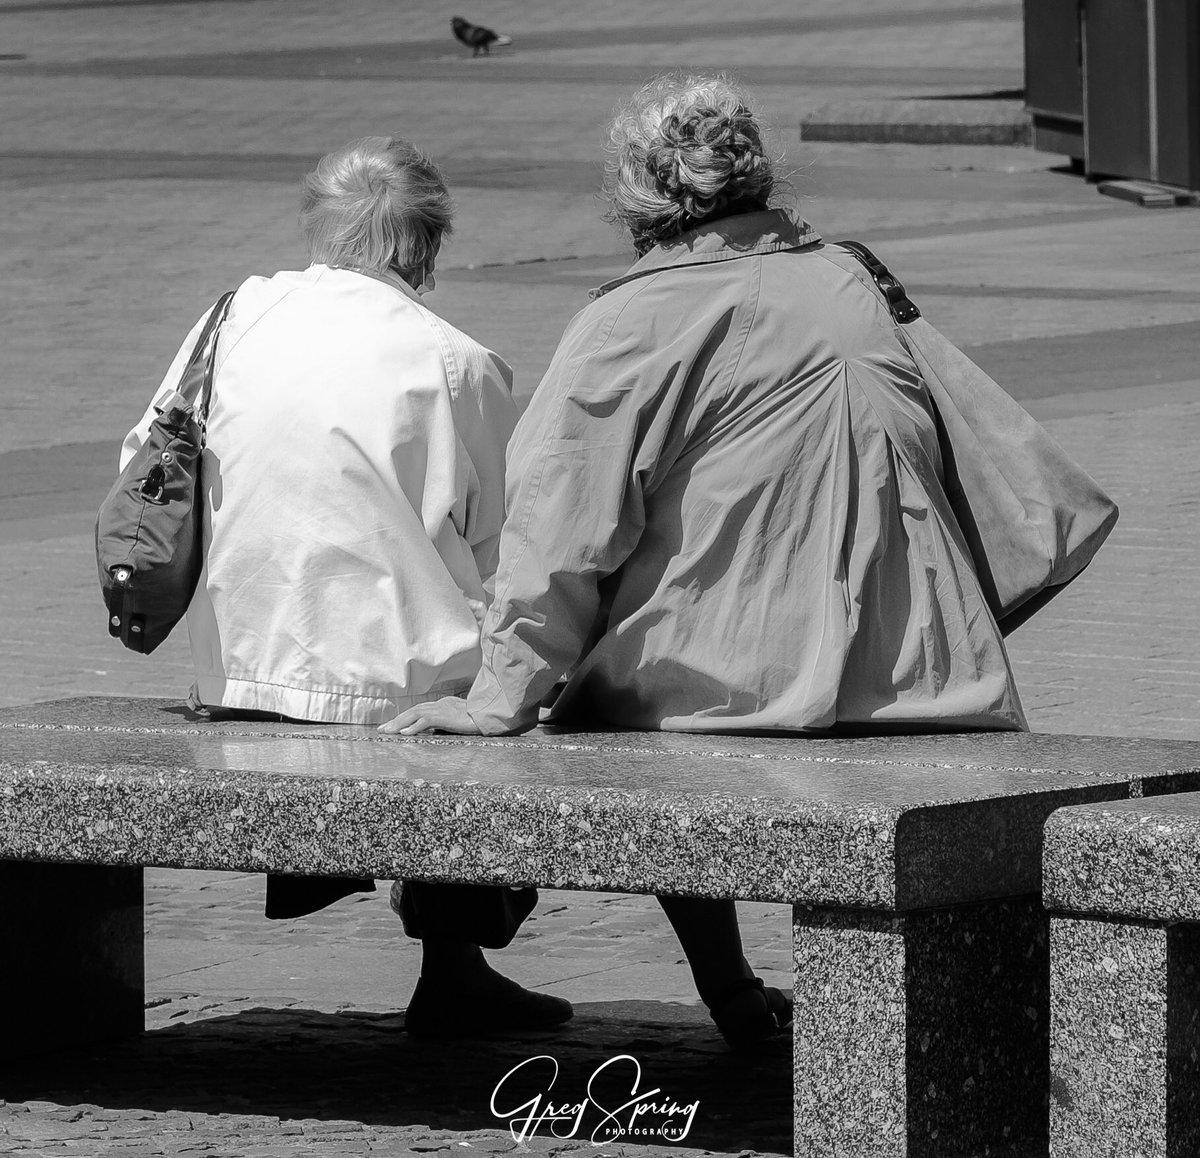 Friends #streetphotography #blackandwhitephoto #bnw #bnw_captures #bnwphotography #streets #streetshot #capturestreets #streetlife #blackandwhitephotography #urbanphotography #urbanphotopic.twitter.com/5r2FFBYdMr